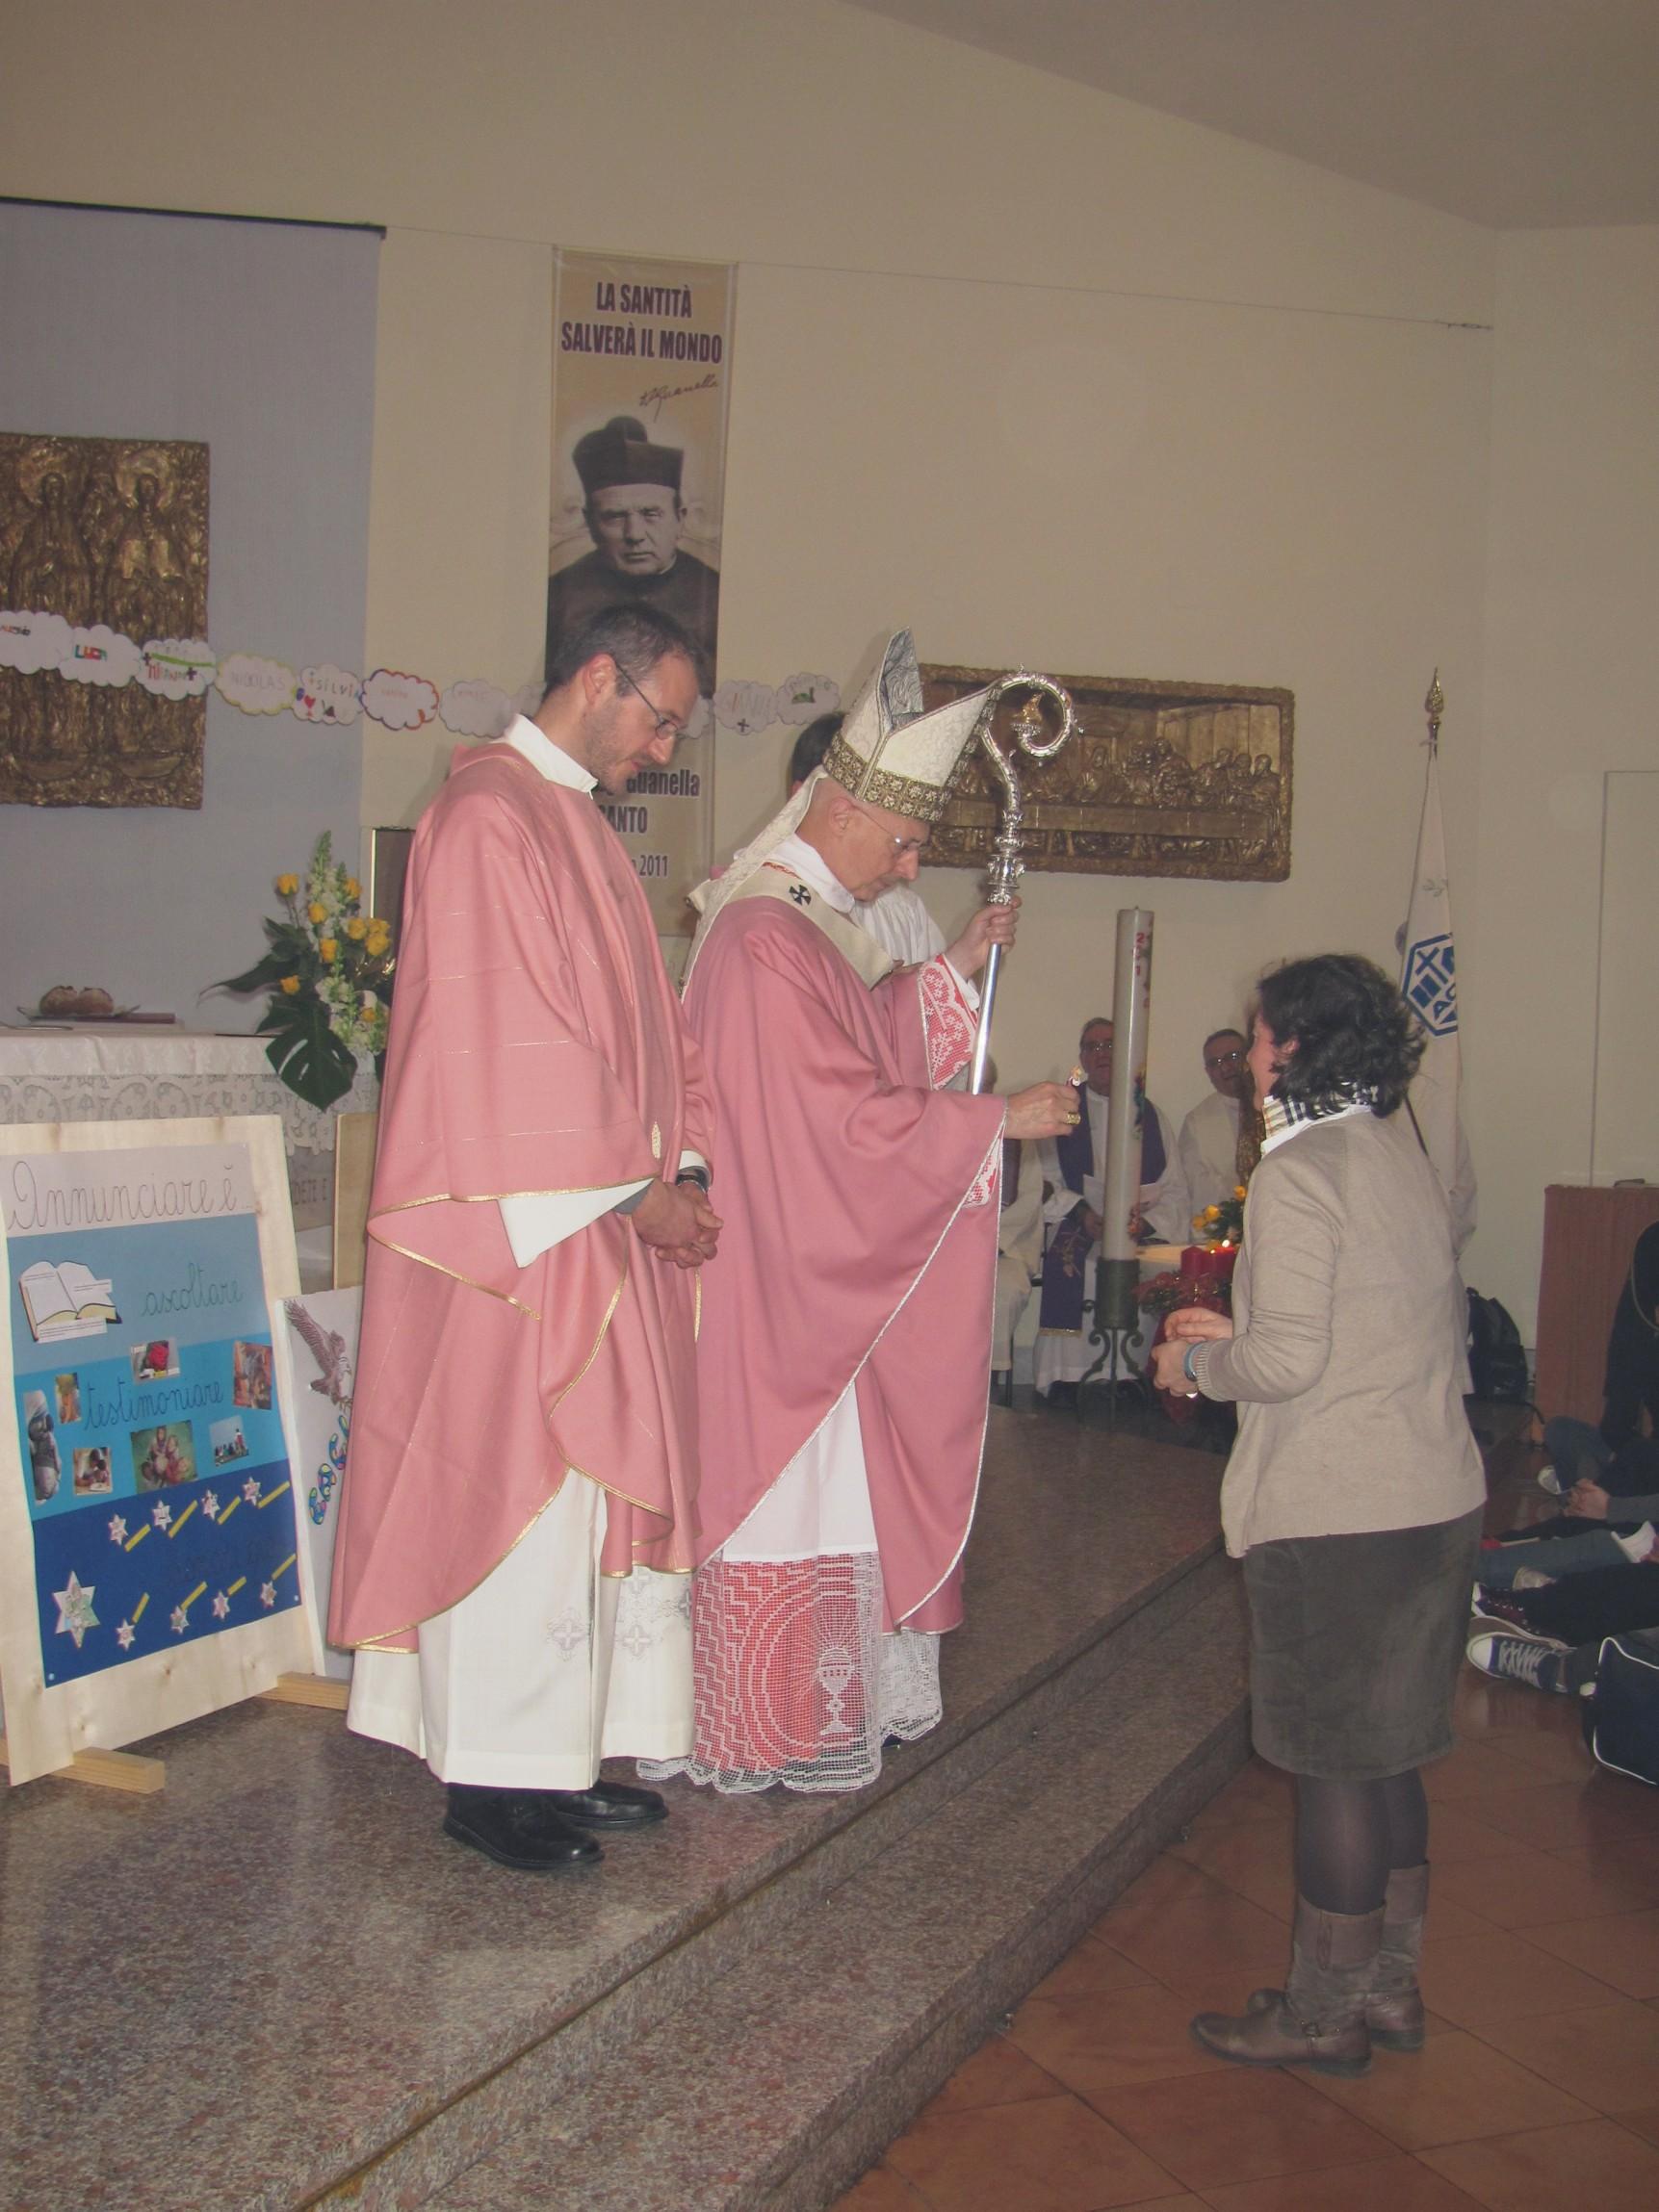 ingresso_giun_spirito_santo_2011-12-11-18-13-06